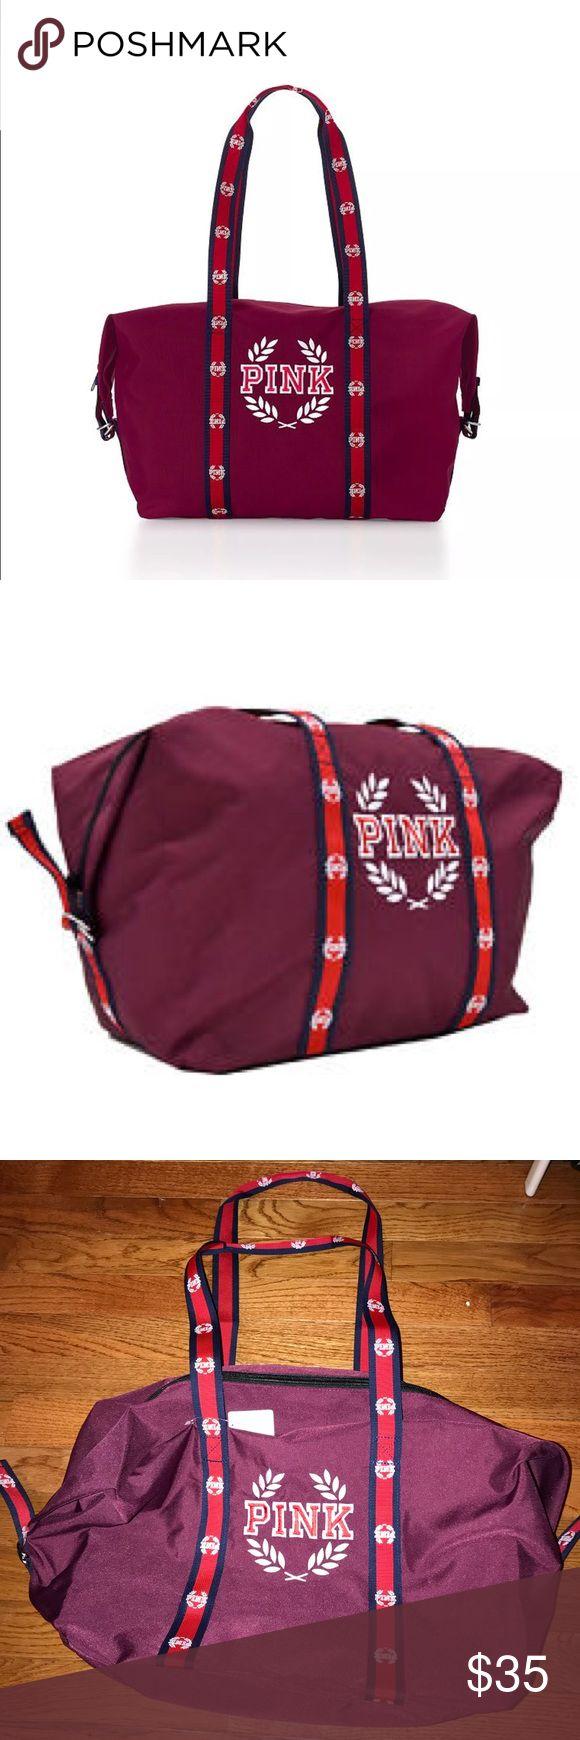 Victoria's Secret pink duffel bag Brand new with tags Victoria's Secret pink duffel bag. Color is burgundy/red PINK Victoria's Secret Bags Totes